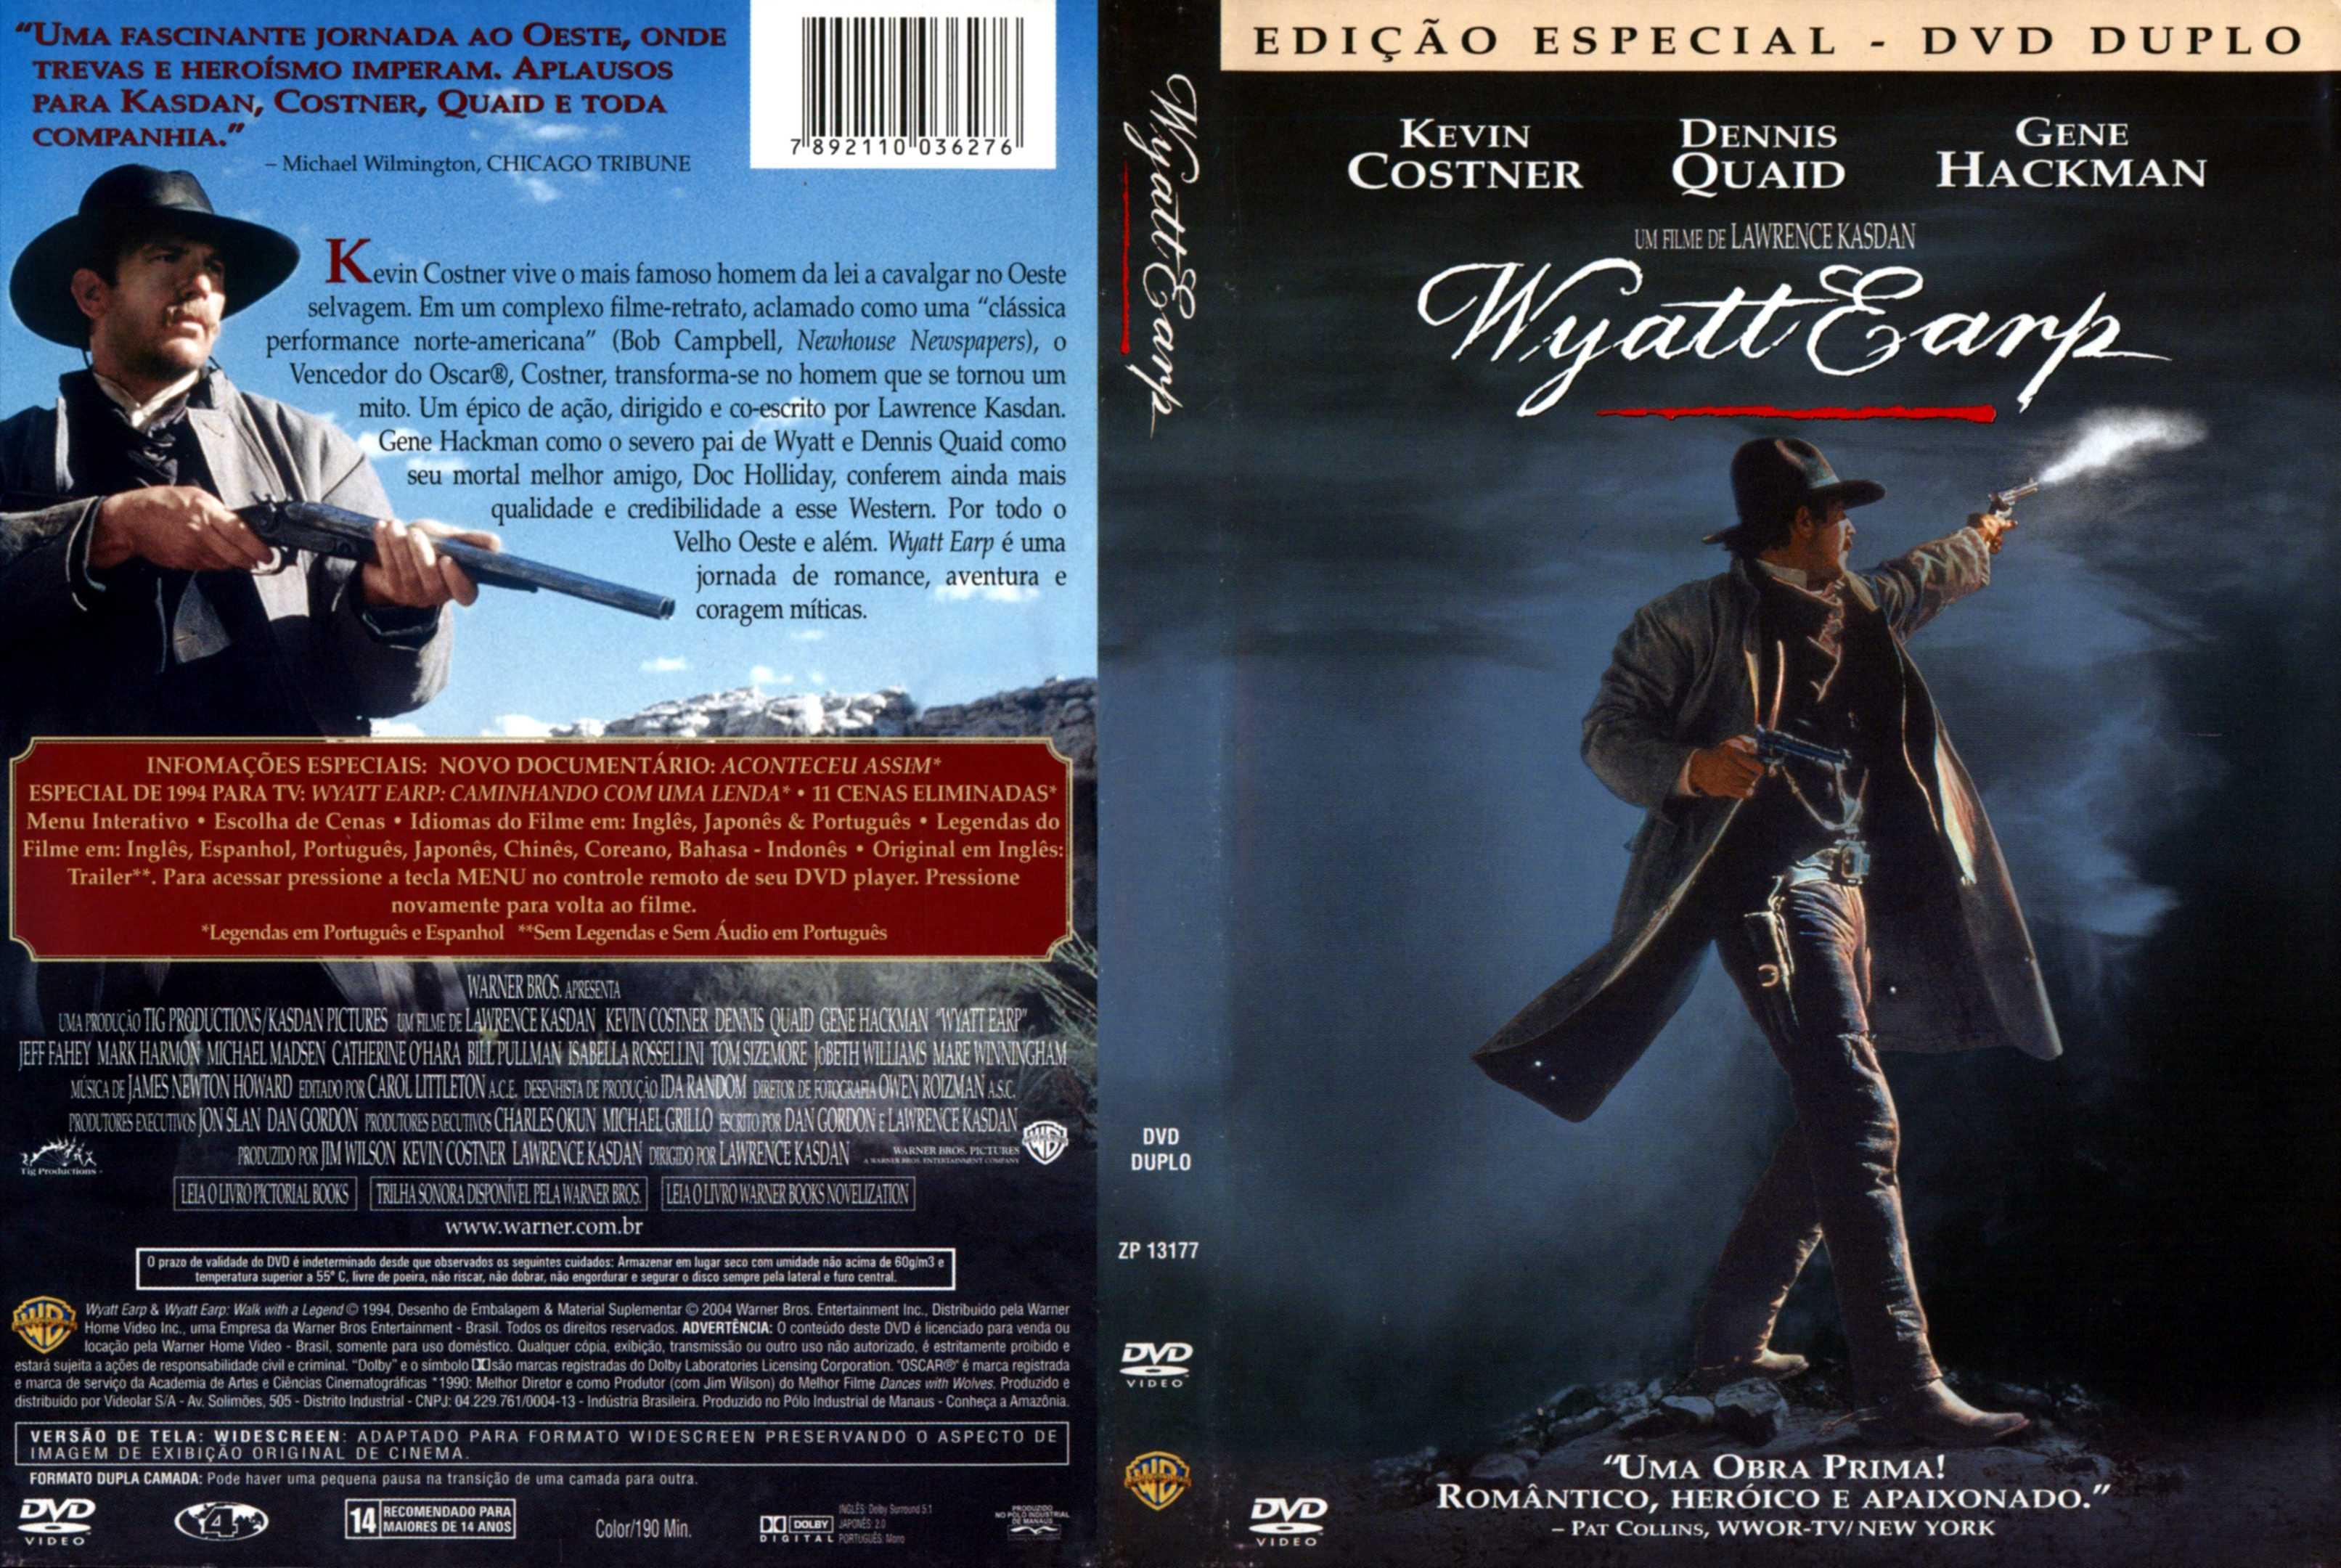 BAIXAR 1994 FILME EARP WYATT